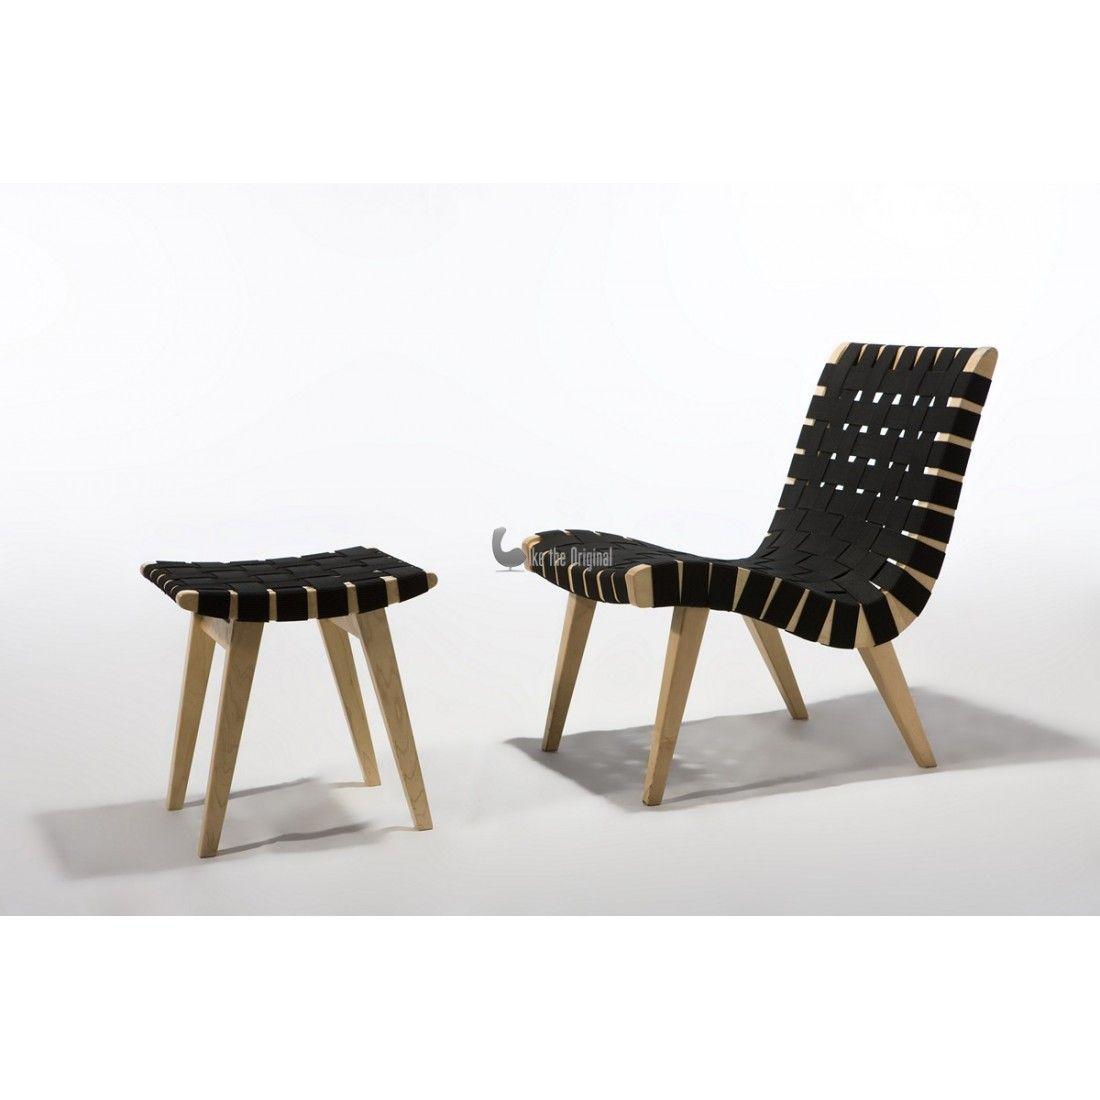 Jens Risom U2013 Lounge Chair U0026 Ottoman Natural Beech $479, Natural White Oak  $538,